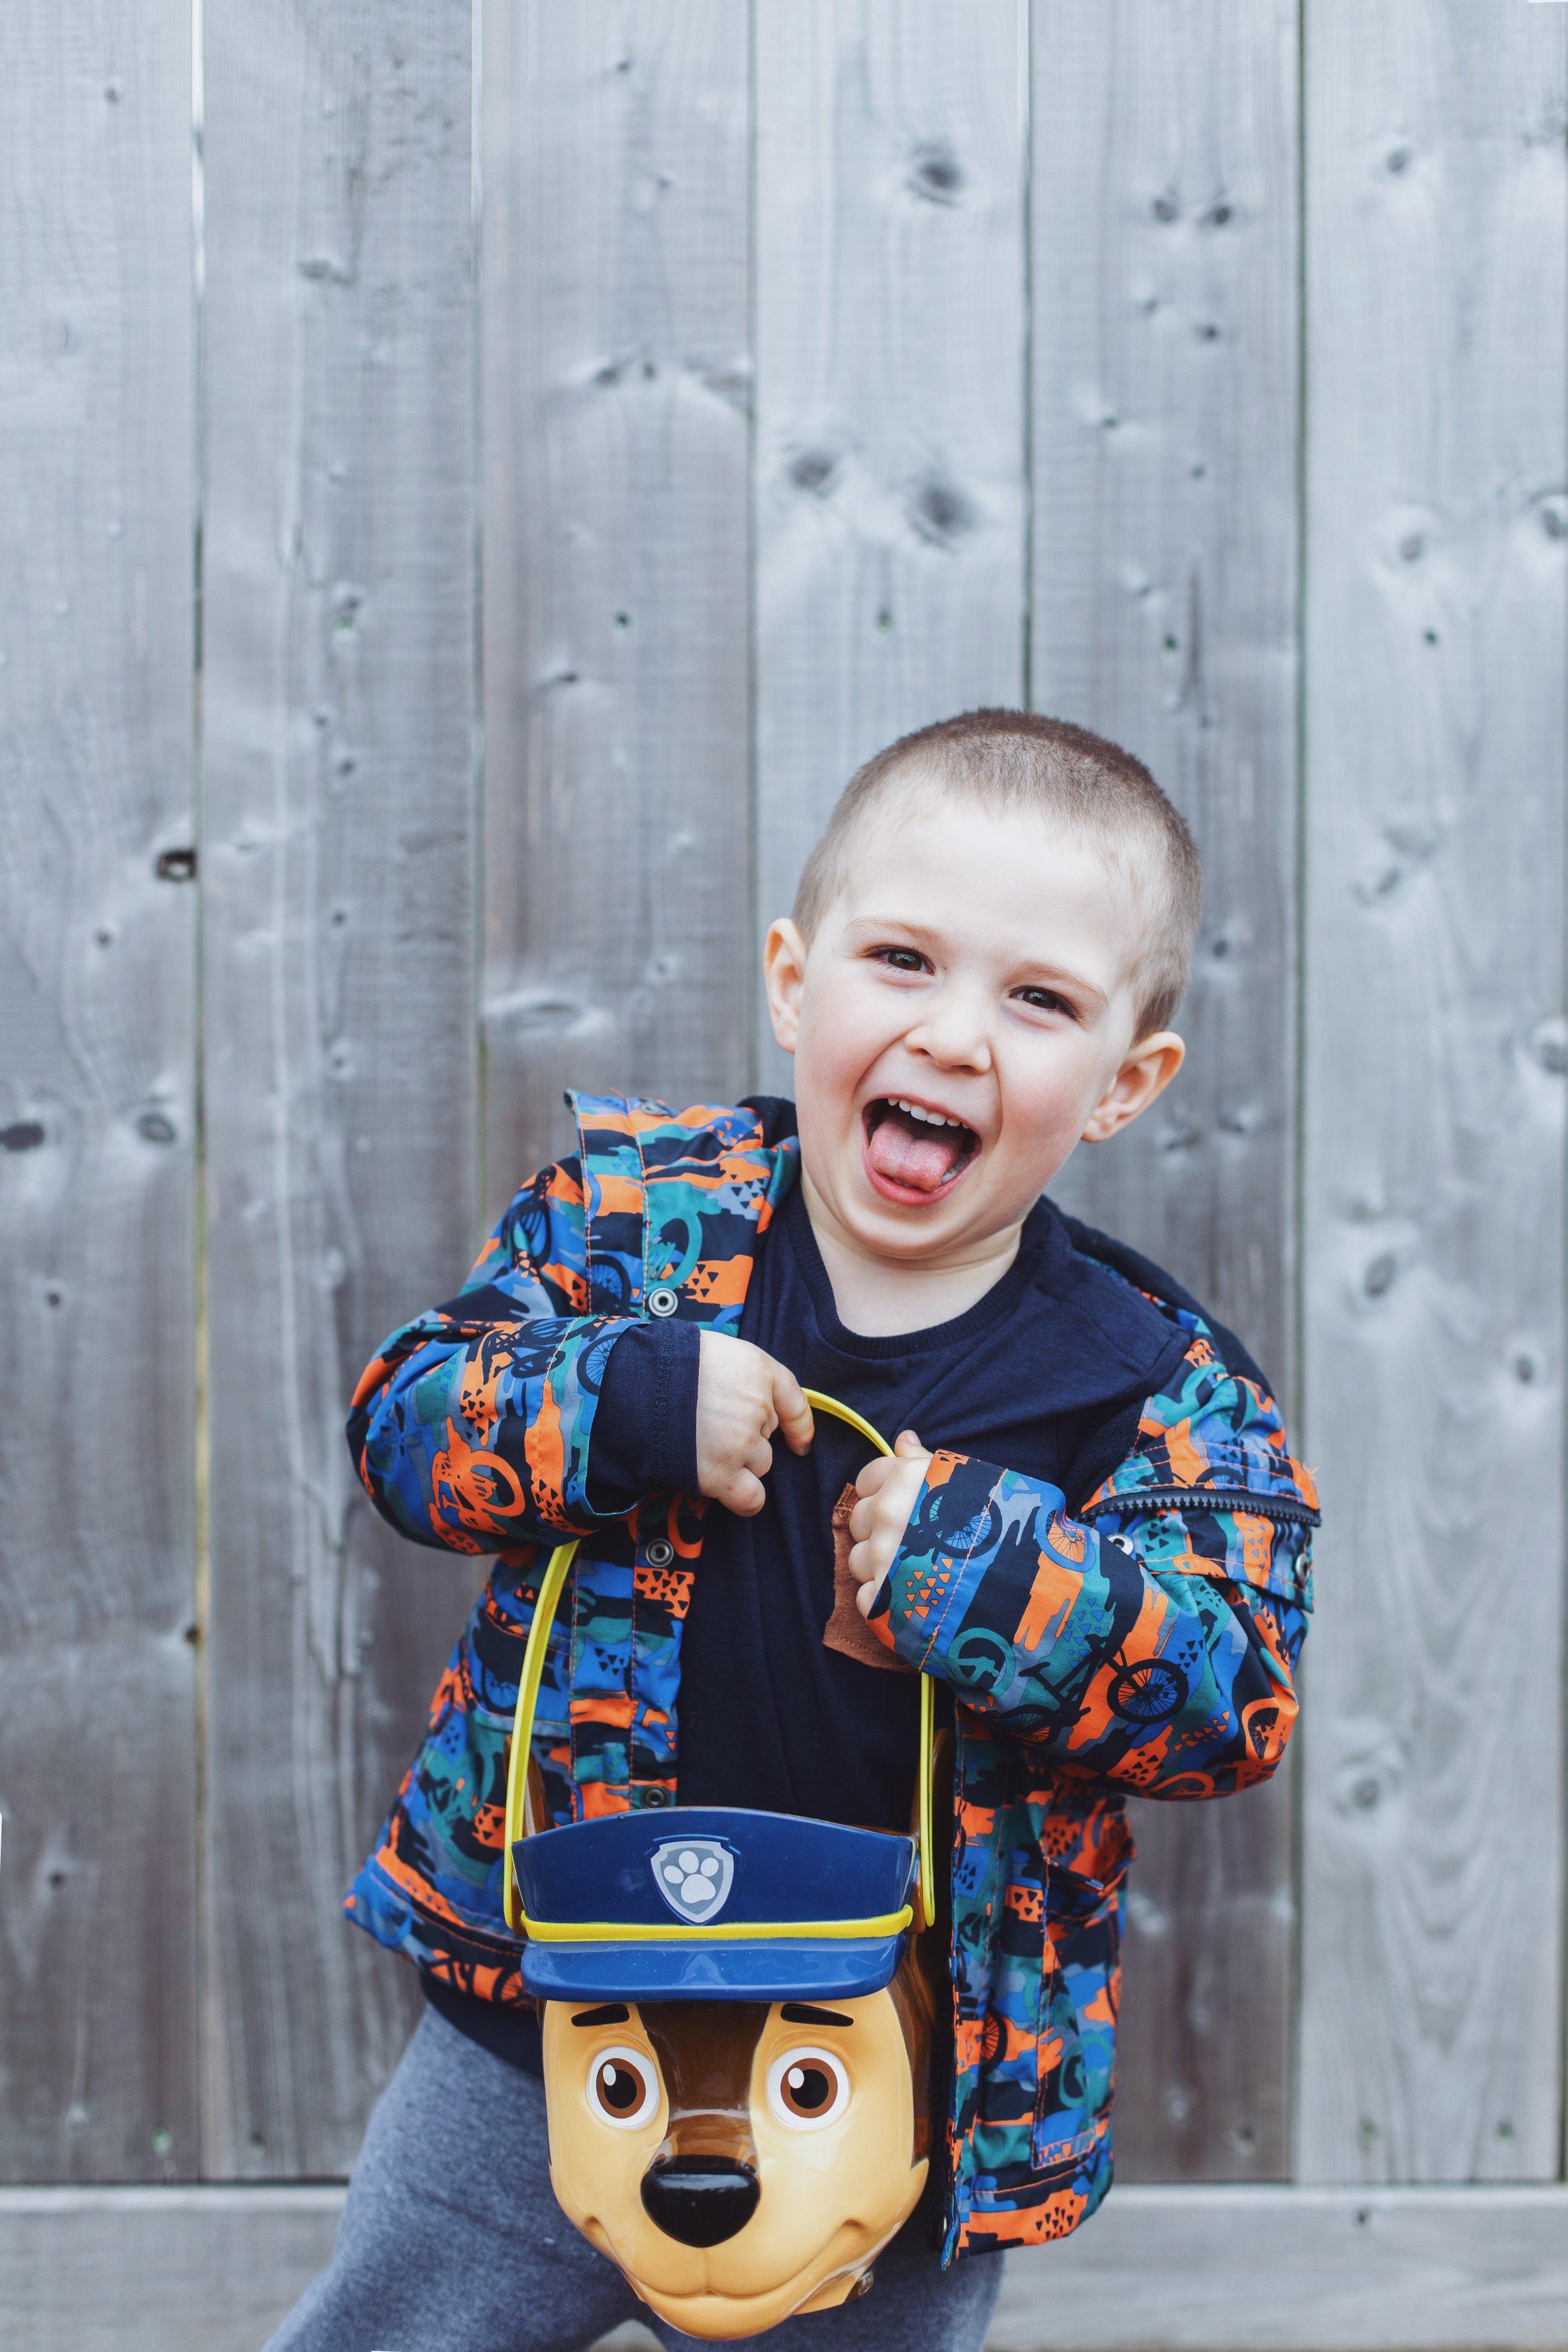 April 21st - My awesome nephew, Hugh